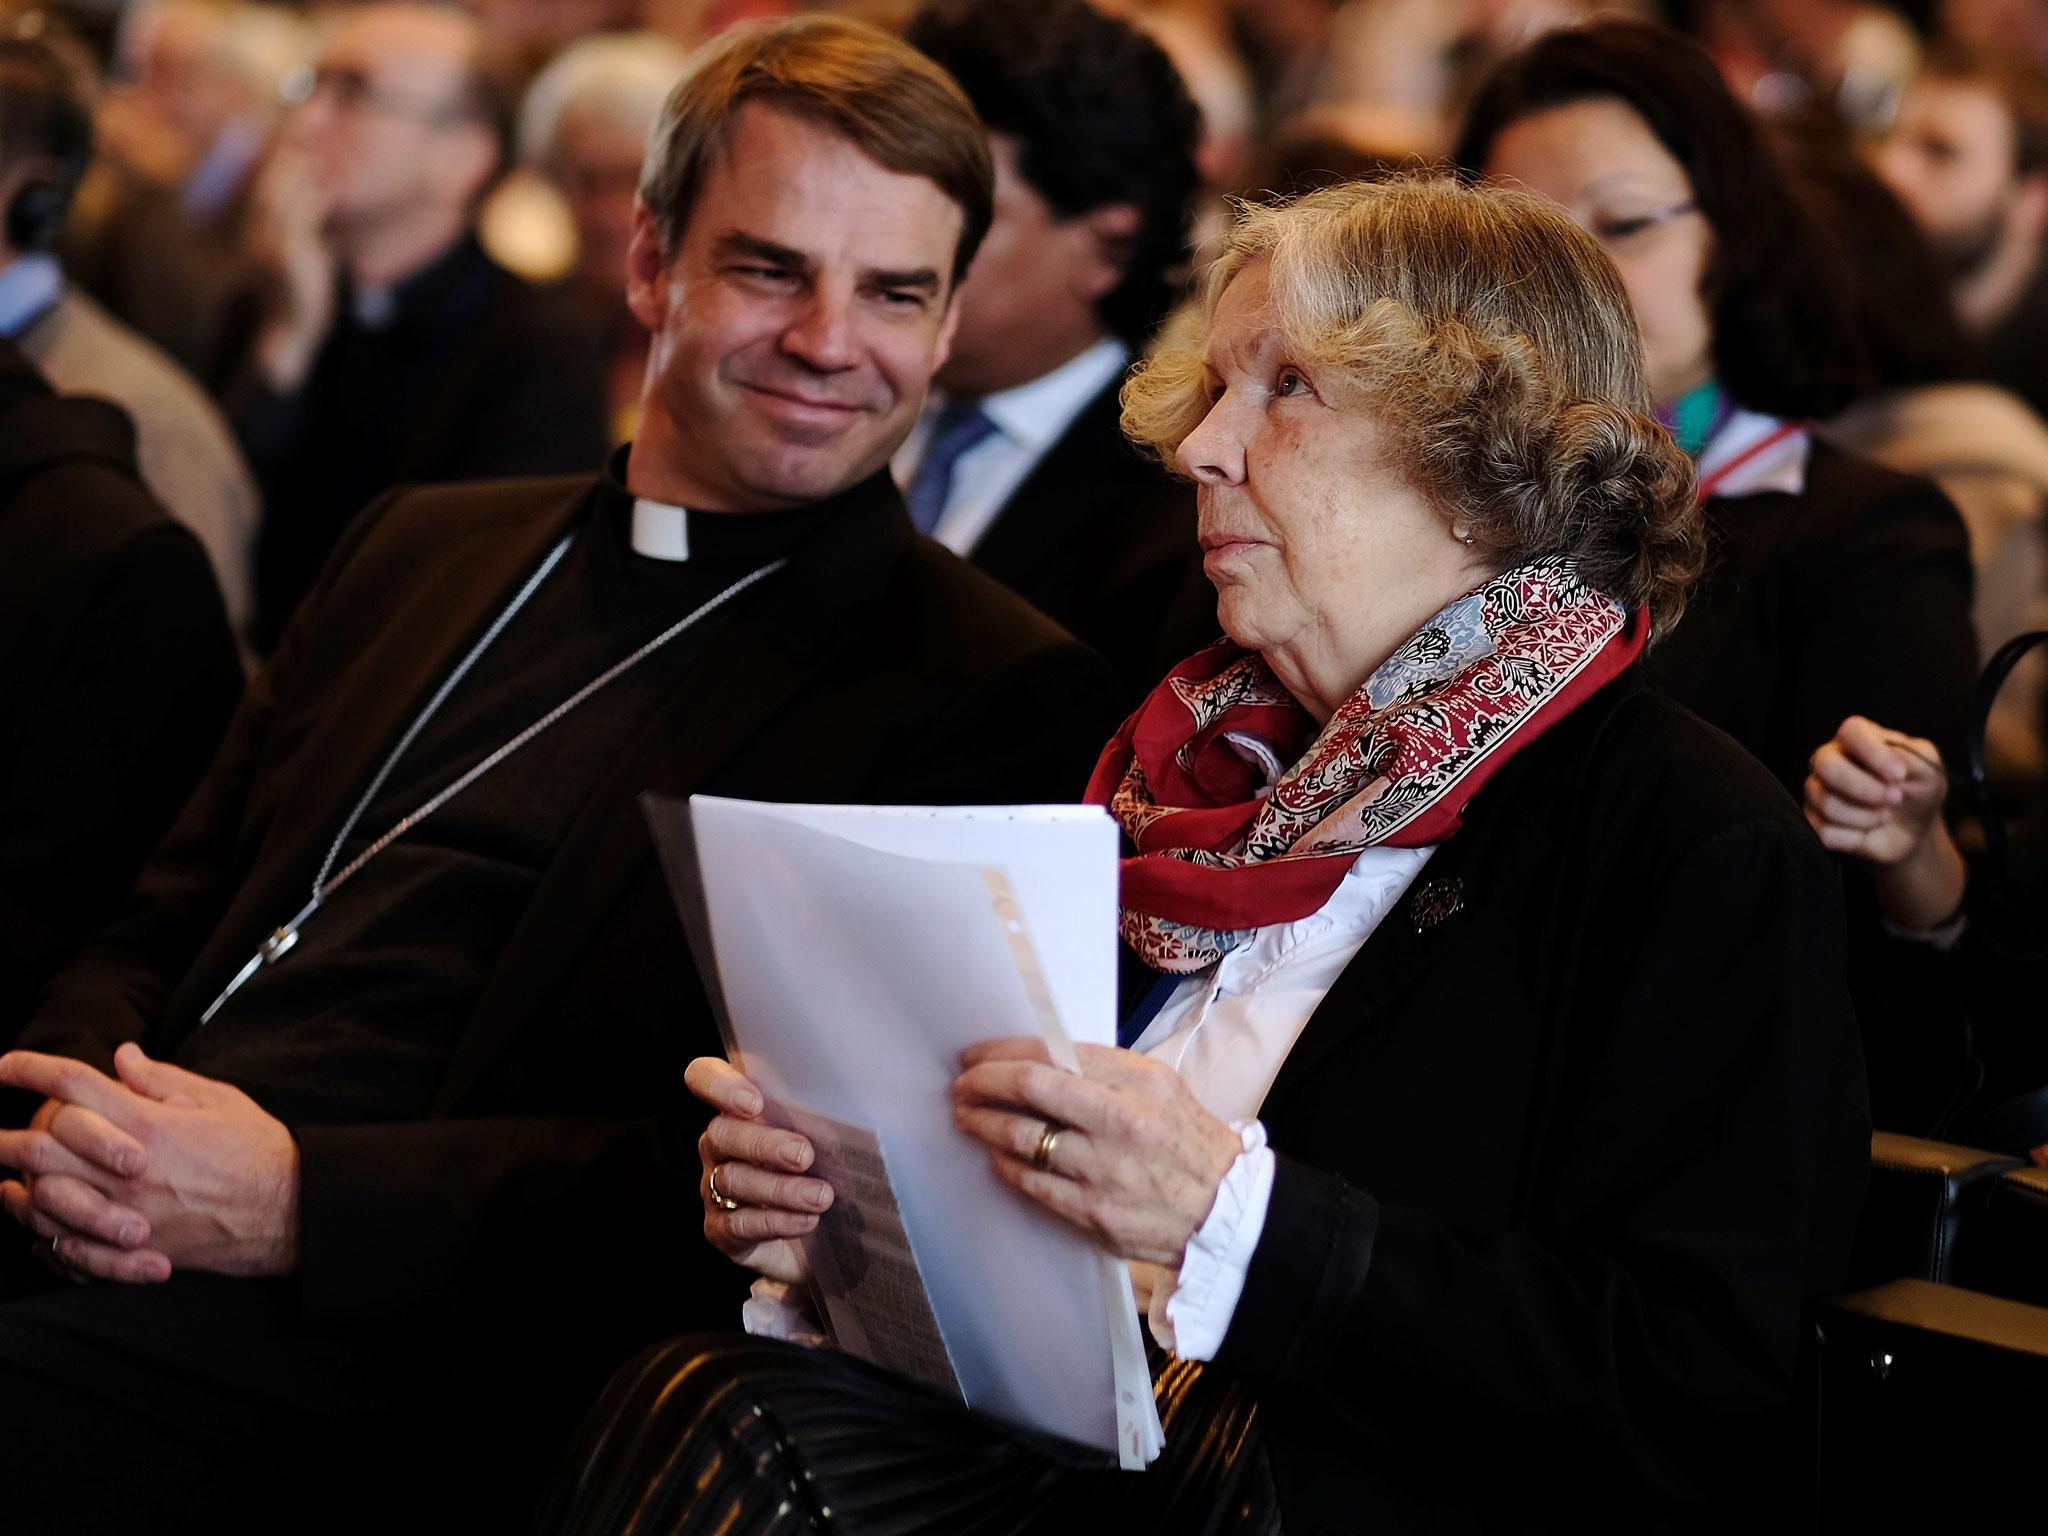 Bischof Stefan Oster, Prof. Dr. Hanna-Barbara Gerl-Falkovitz